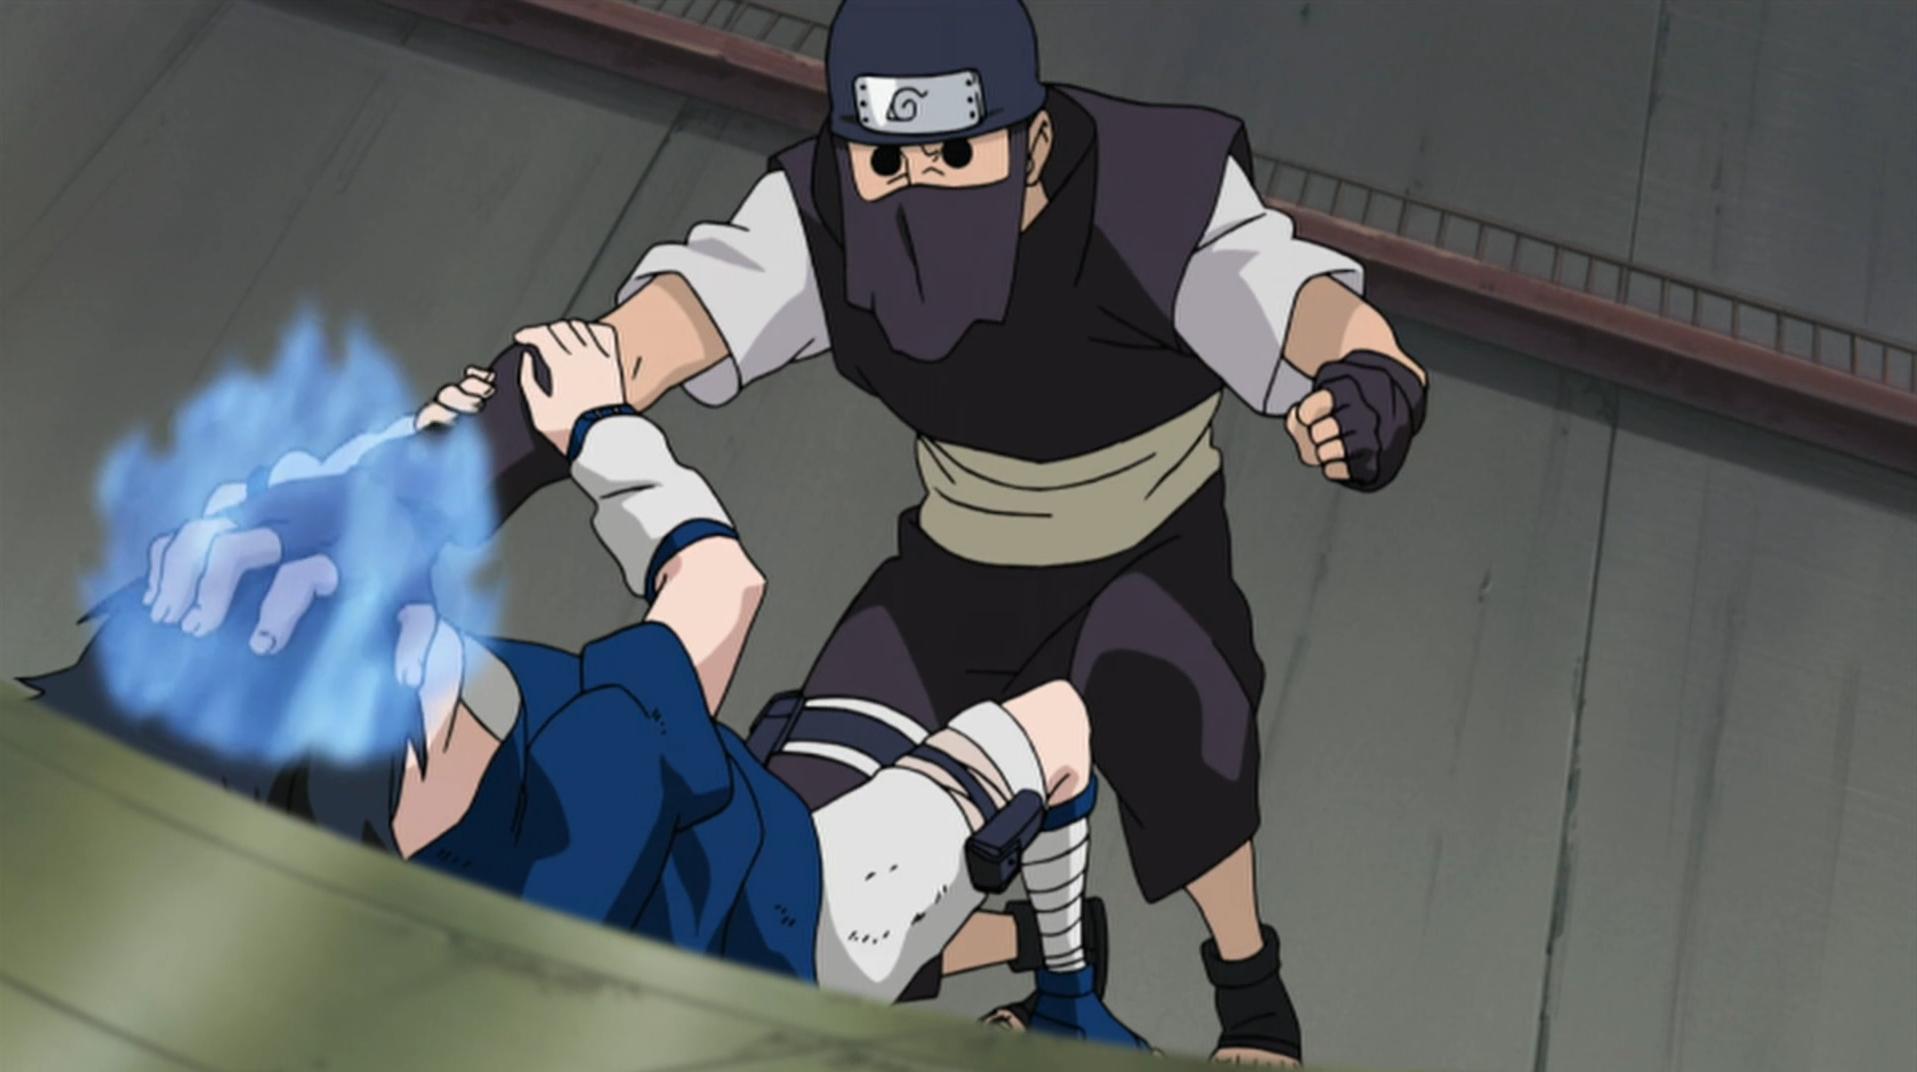 Shinobi fights 2 hentai game - 1 4